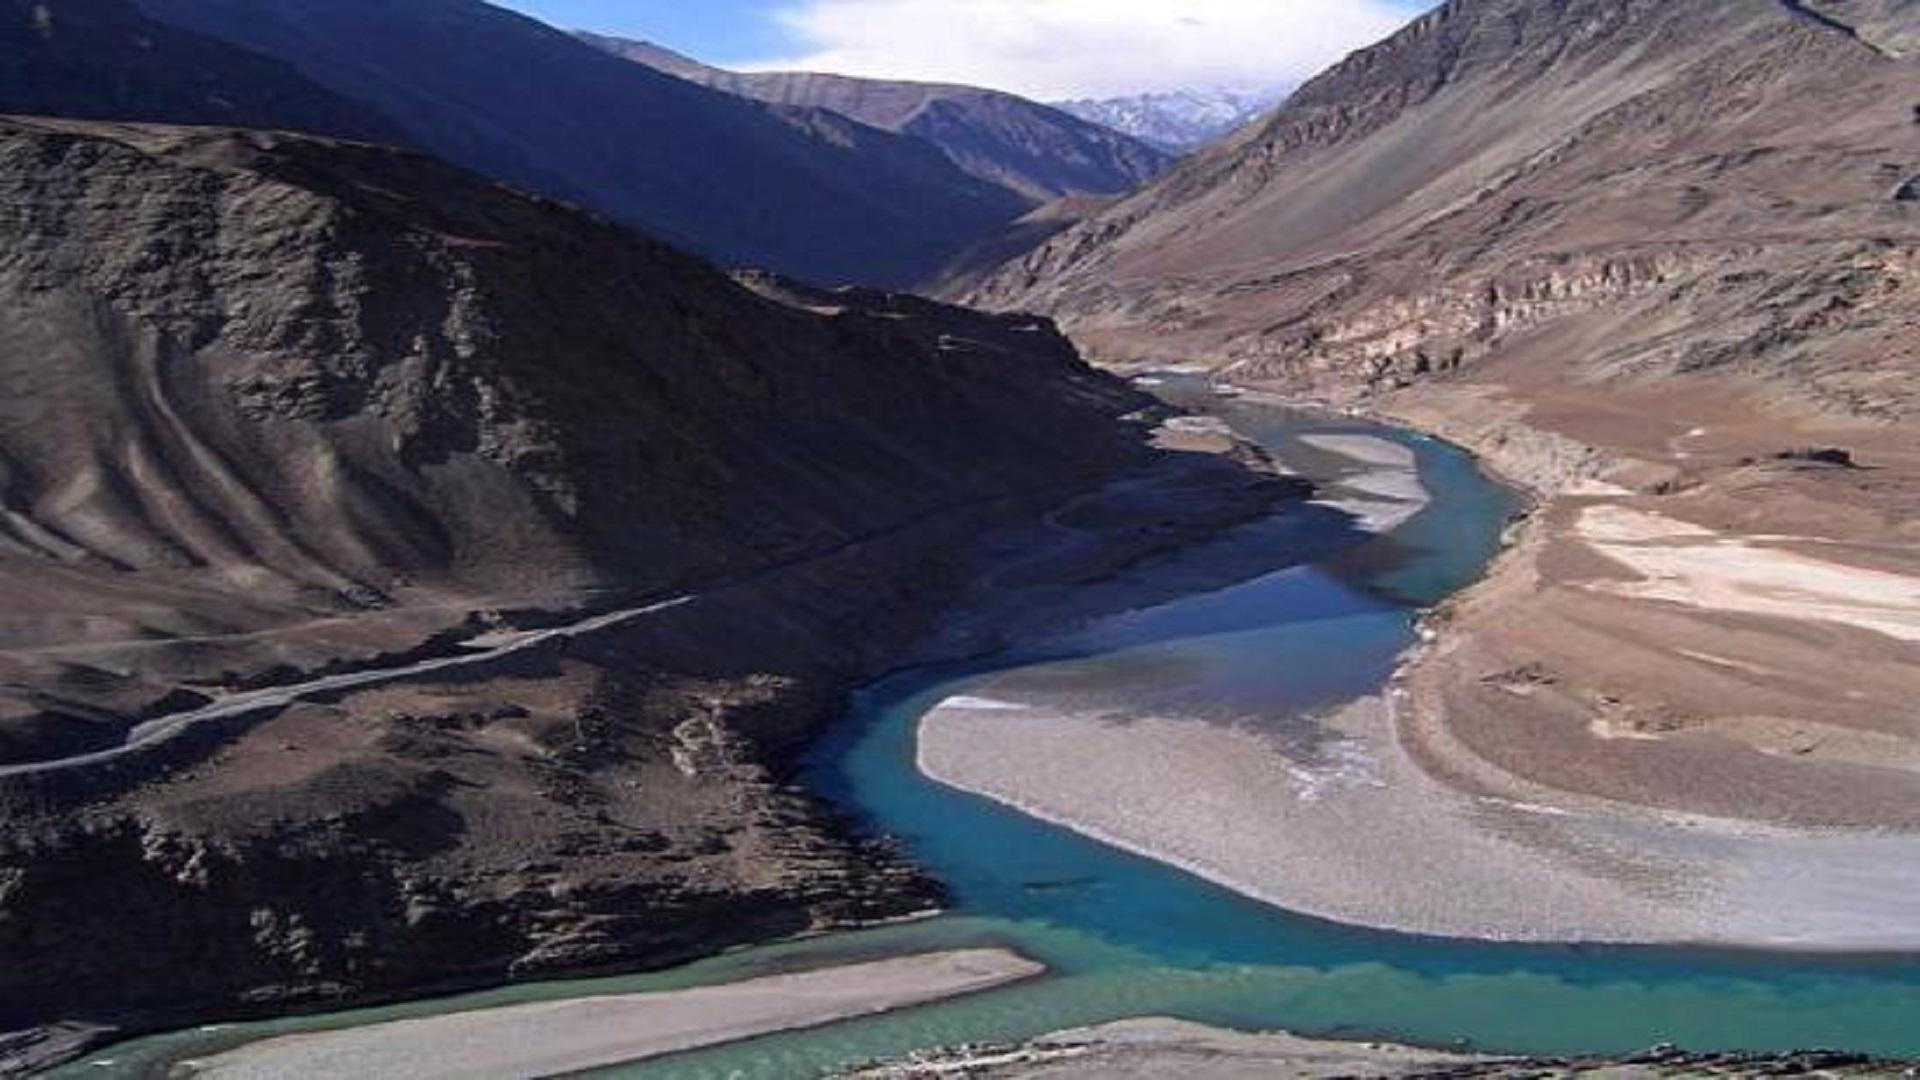 Indus Beautiful River Free Hd Wallpaper